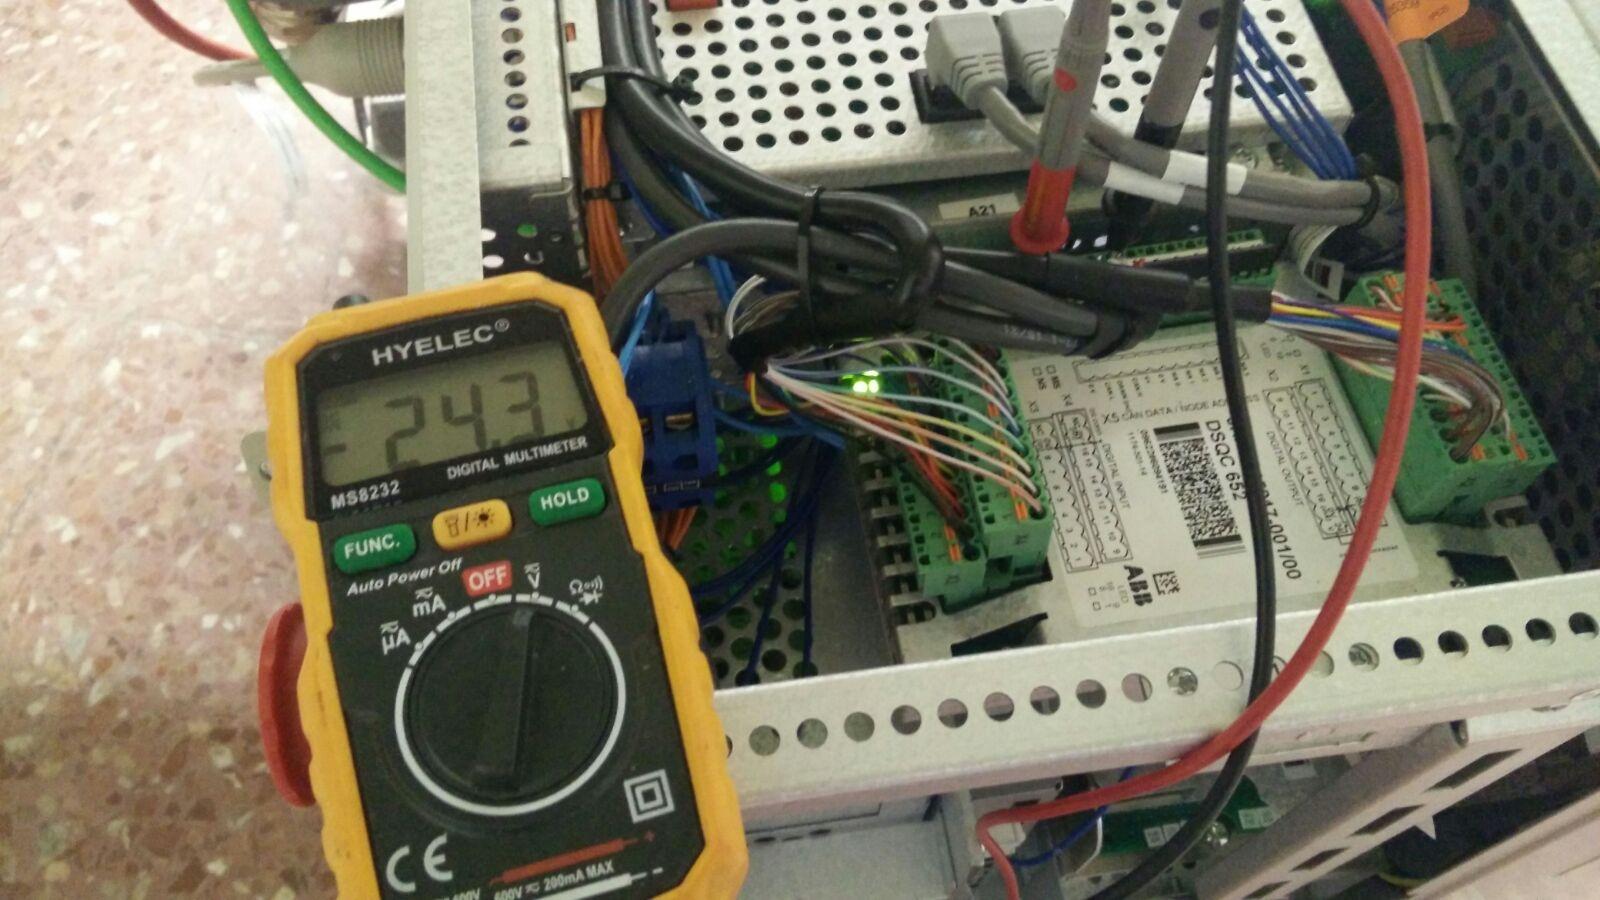 abb irc5 compact controller manual